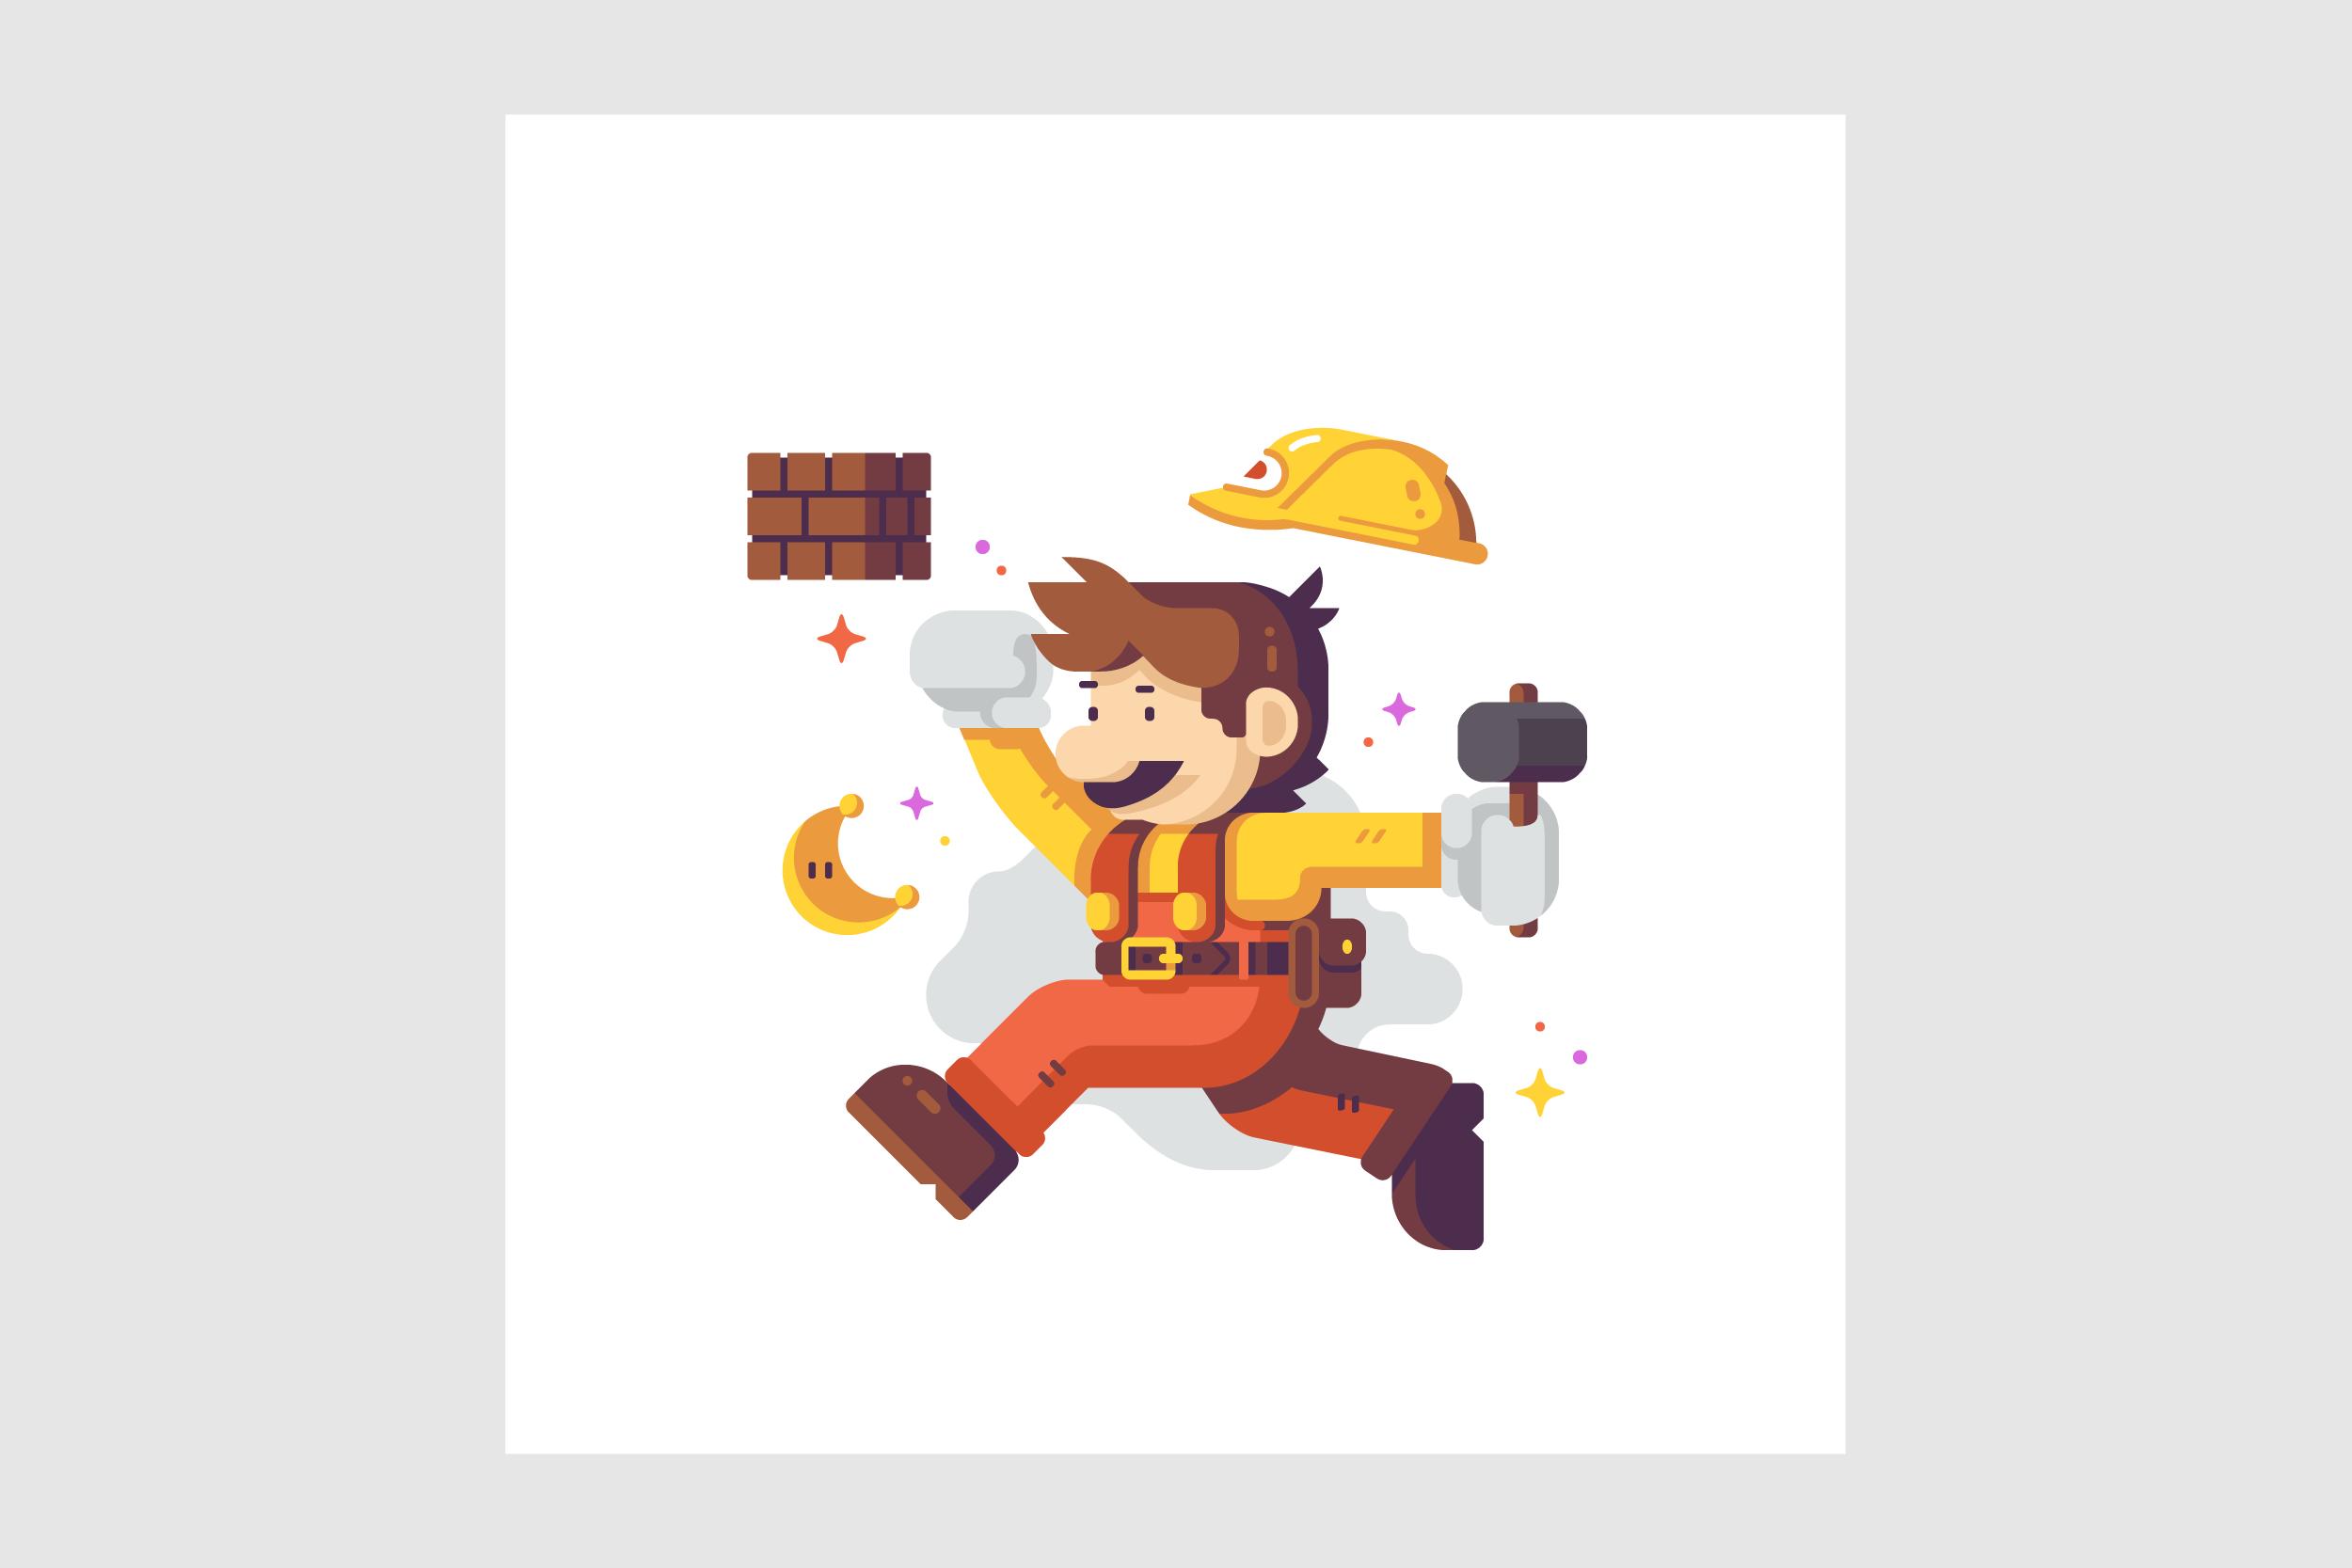 Jump Man Builder by Matt Anderson. Inspired by Super Mario Odyssey.